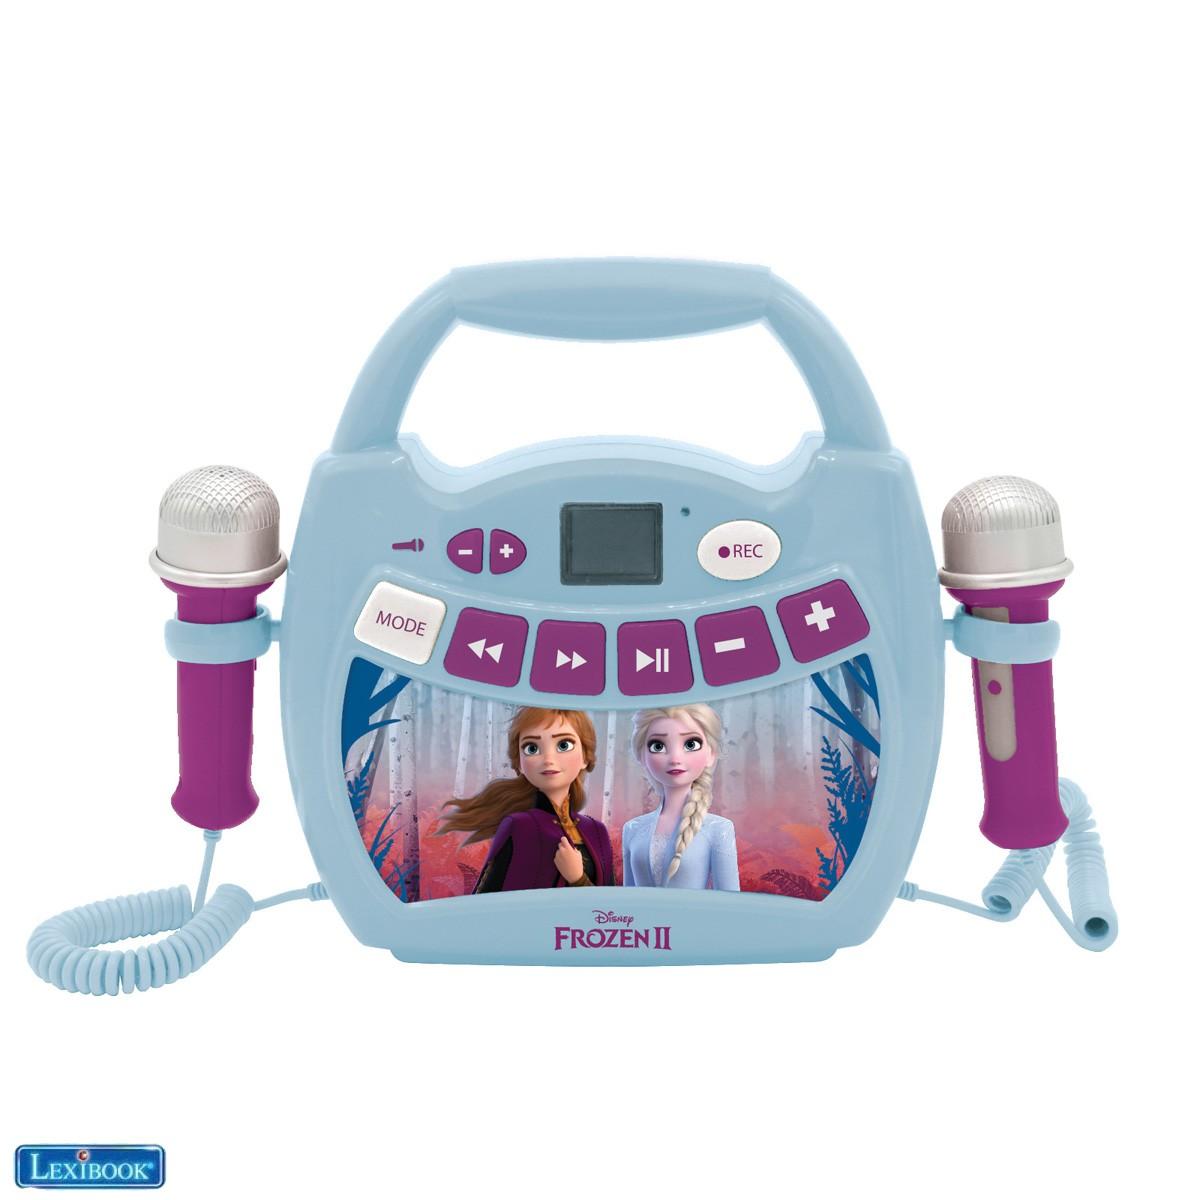 Disney Frozen 2 Elsa, Anna - Mi primer reproductor digital Bluetooth con 2 micrófonos